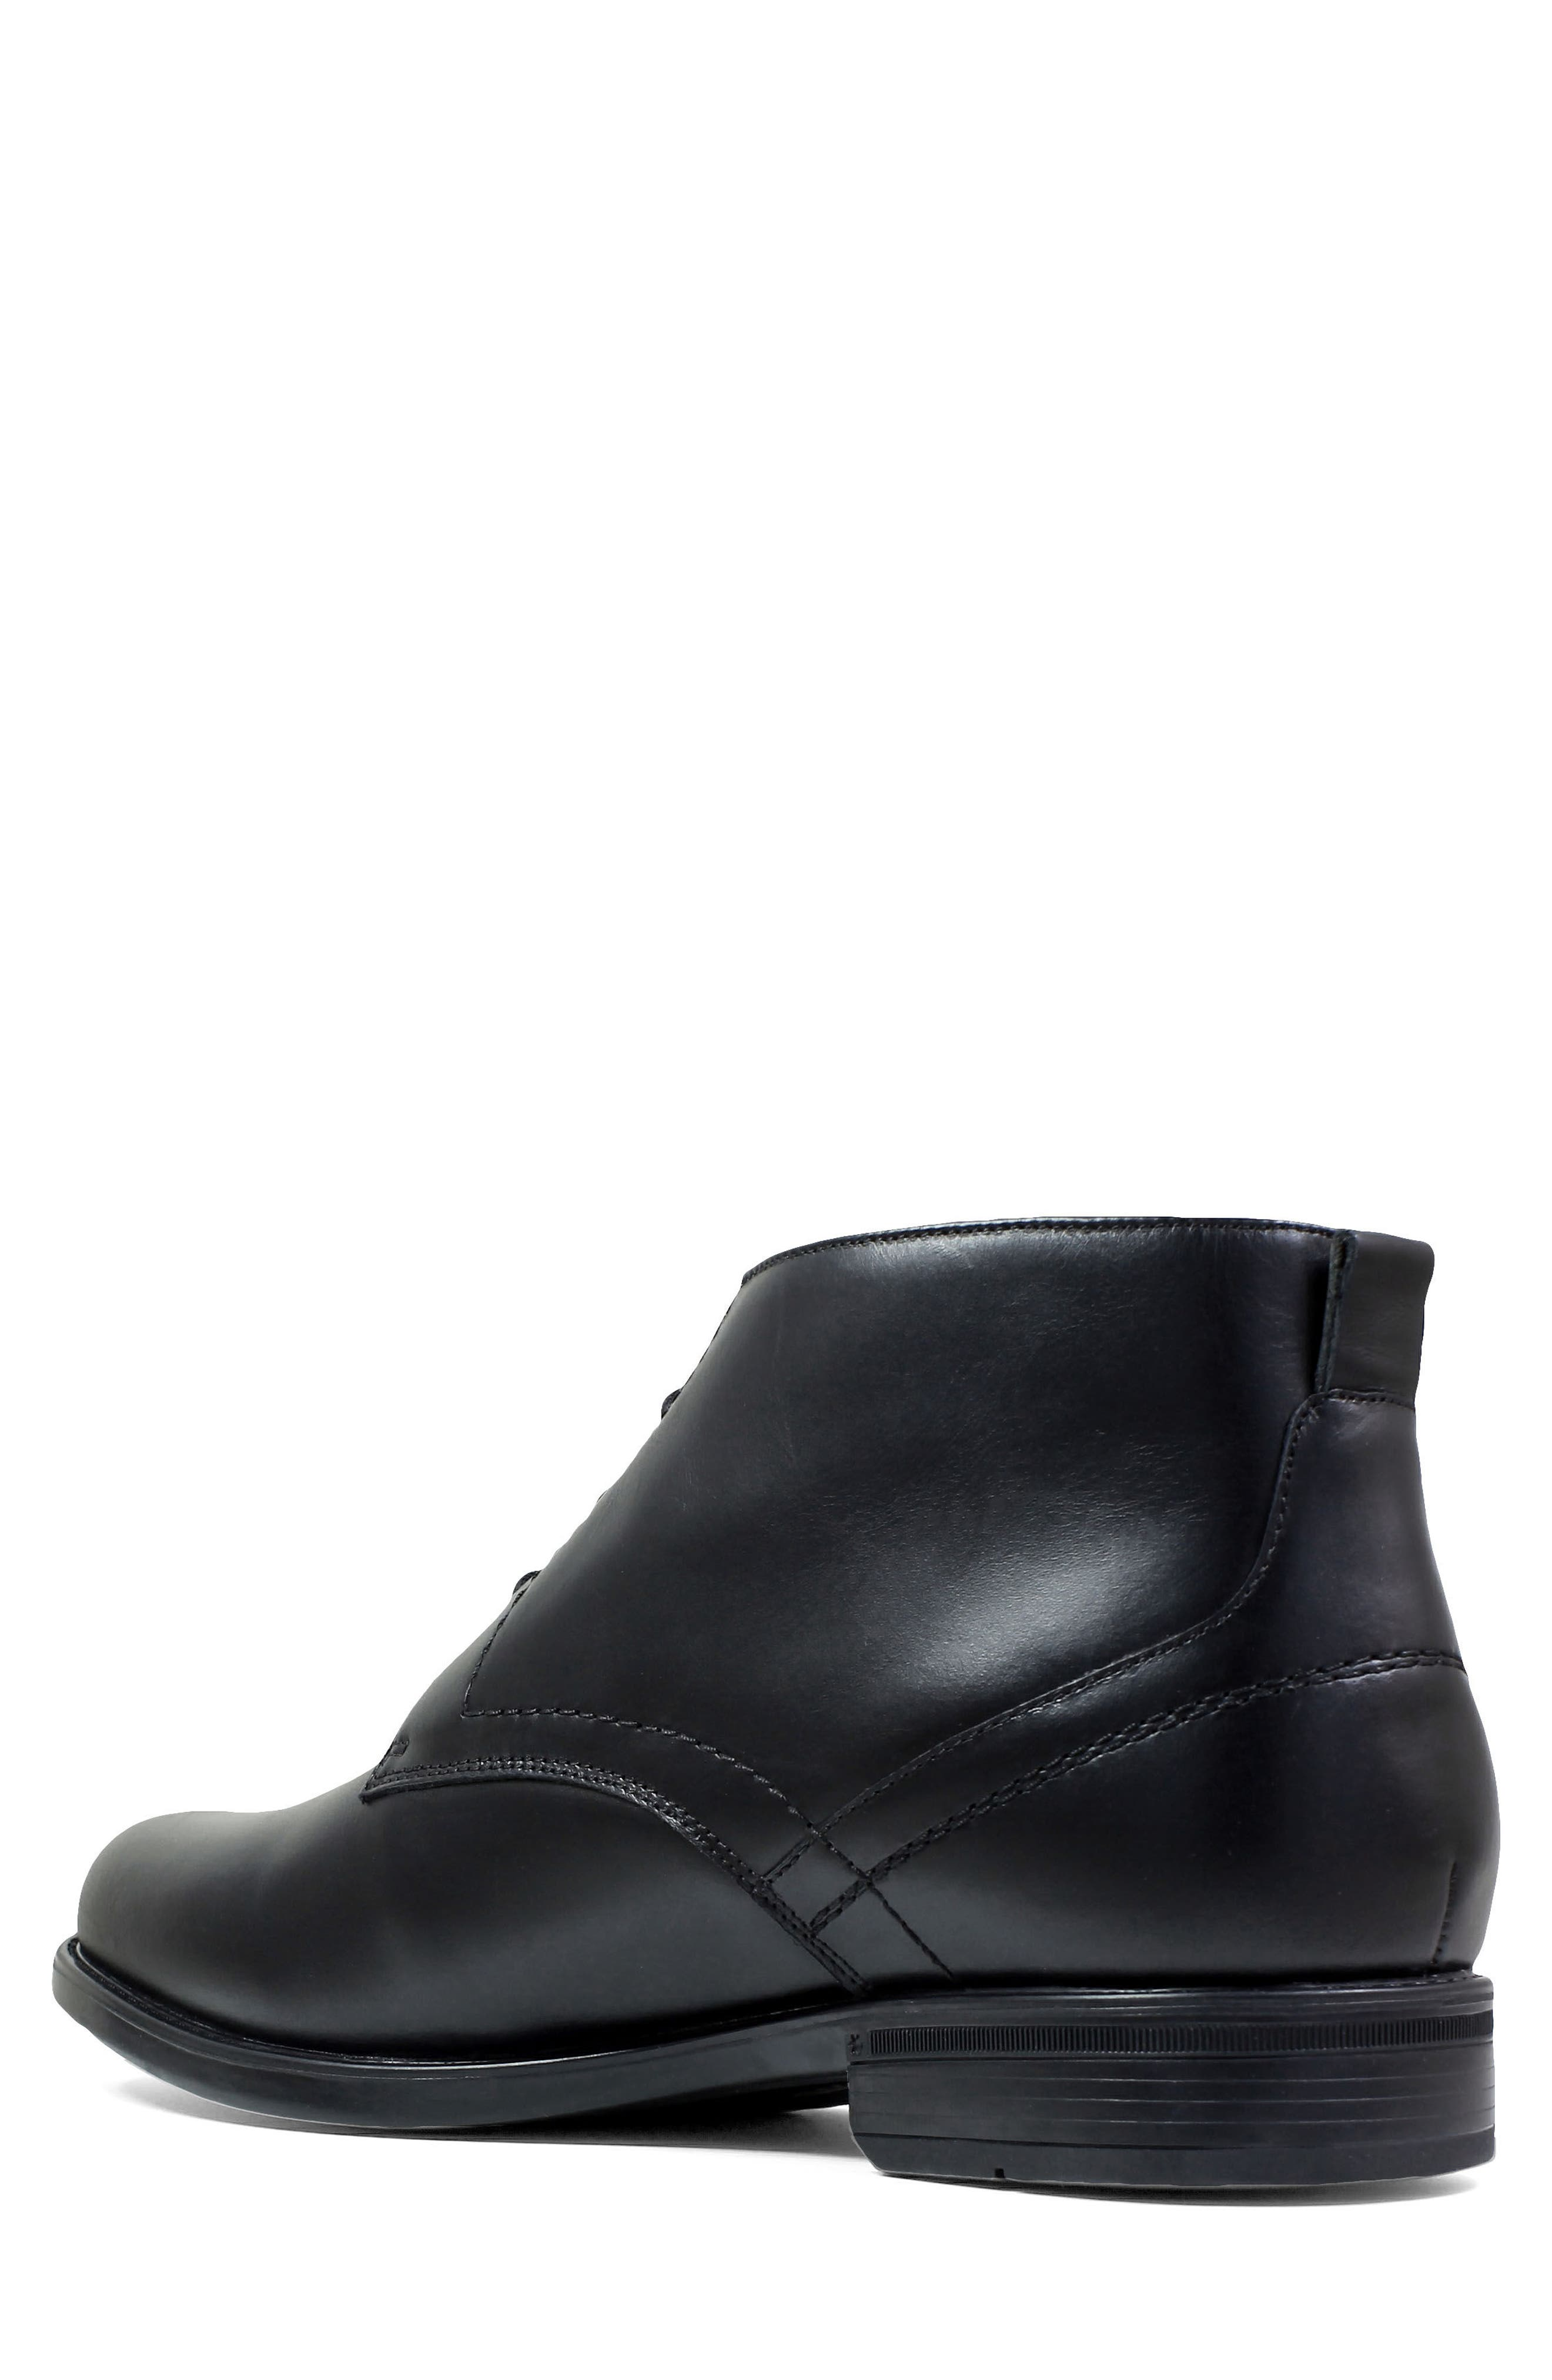 Midtown Waterproof Chukka Boot,                             Alternate thumbnail 2, color,                             BLACK